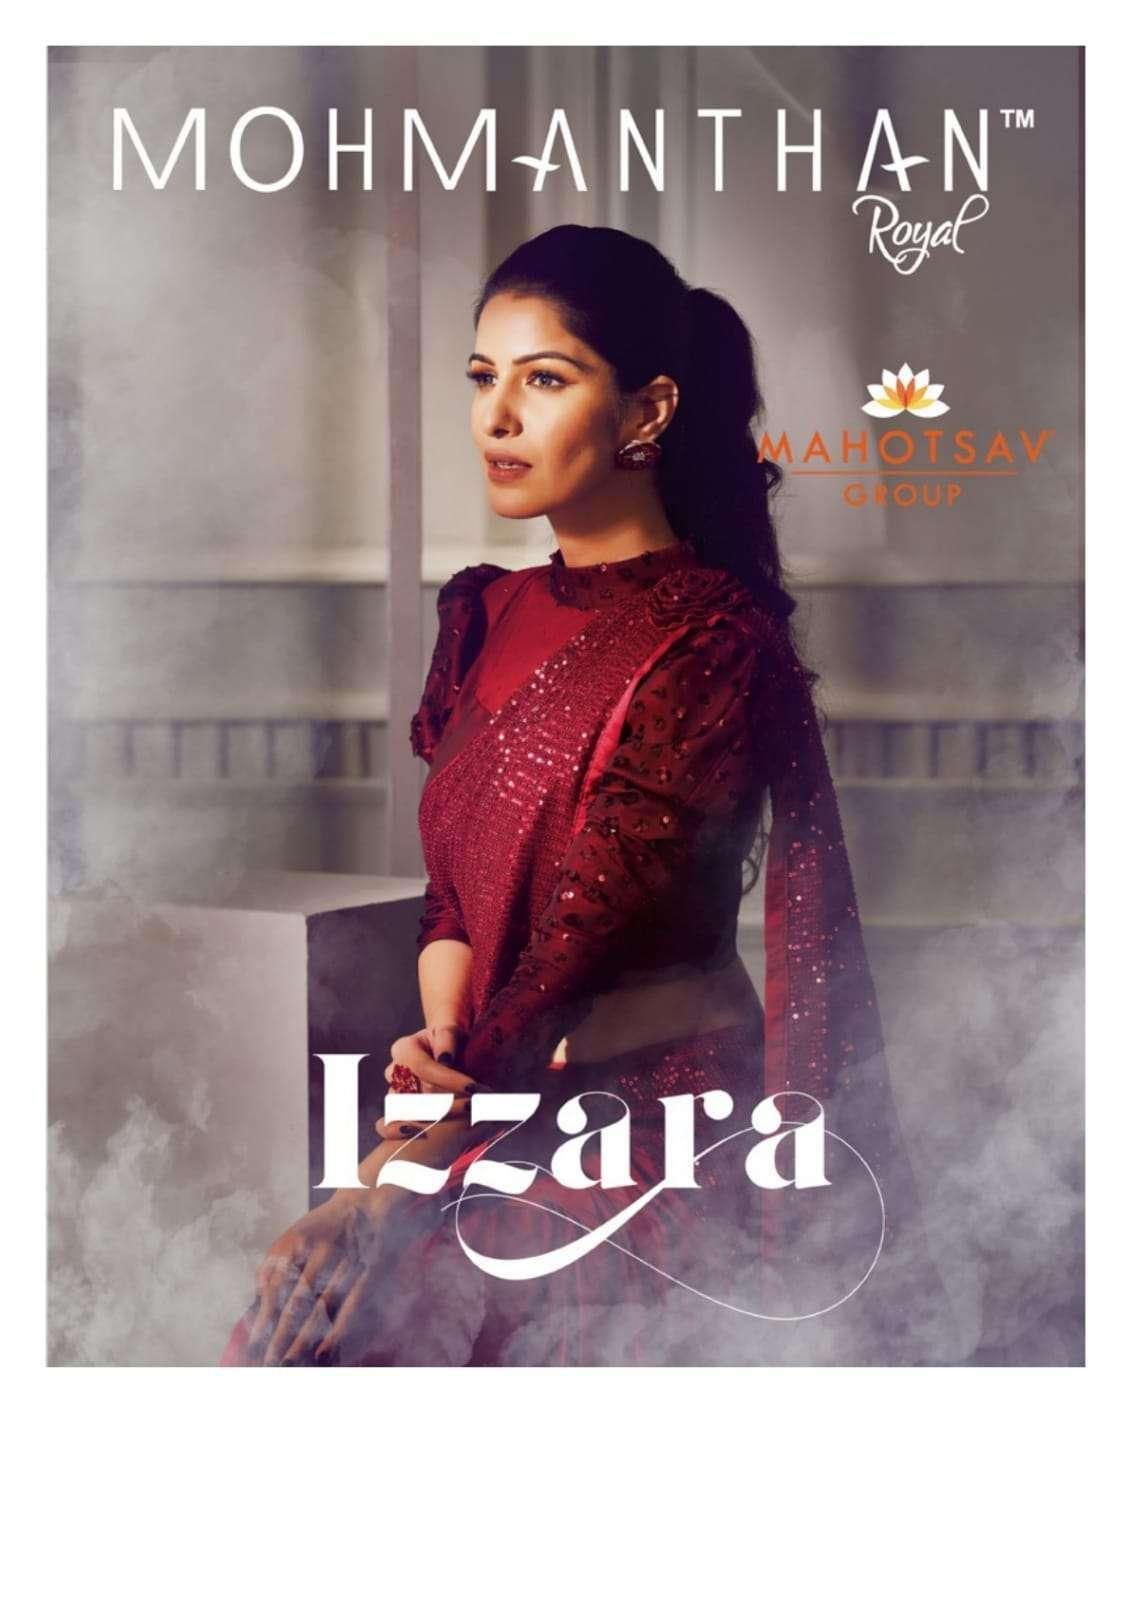 Mahotsav Moh Manthan Izzara 21501 to 215018 Series Fancy Designer Sarees Collection